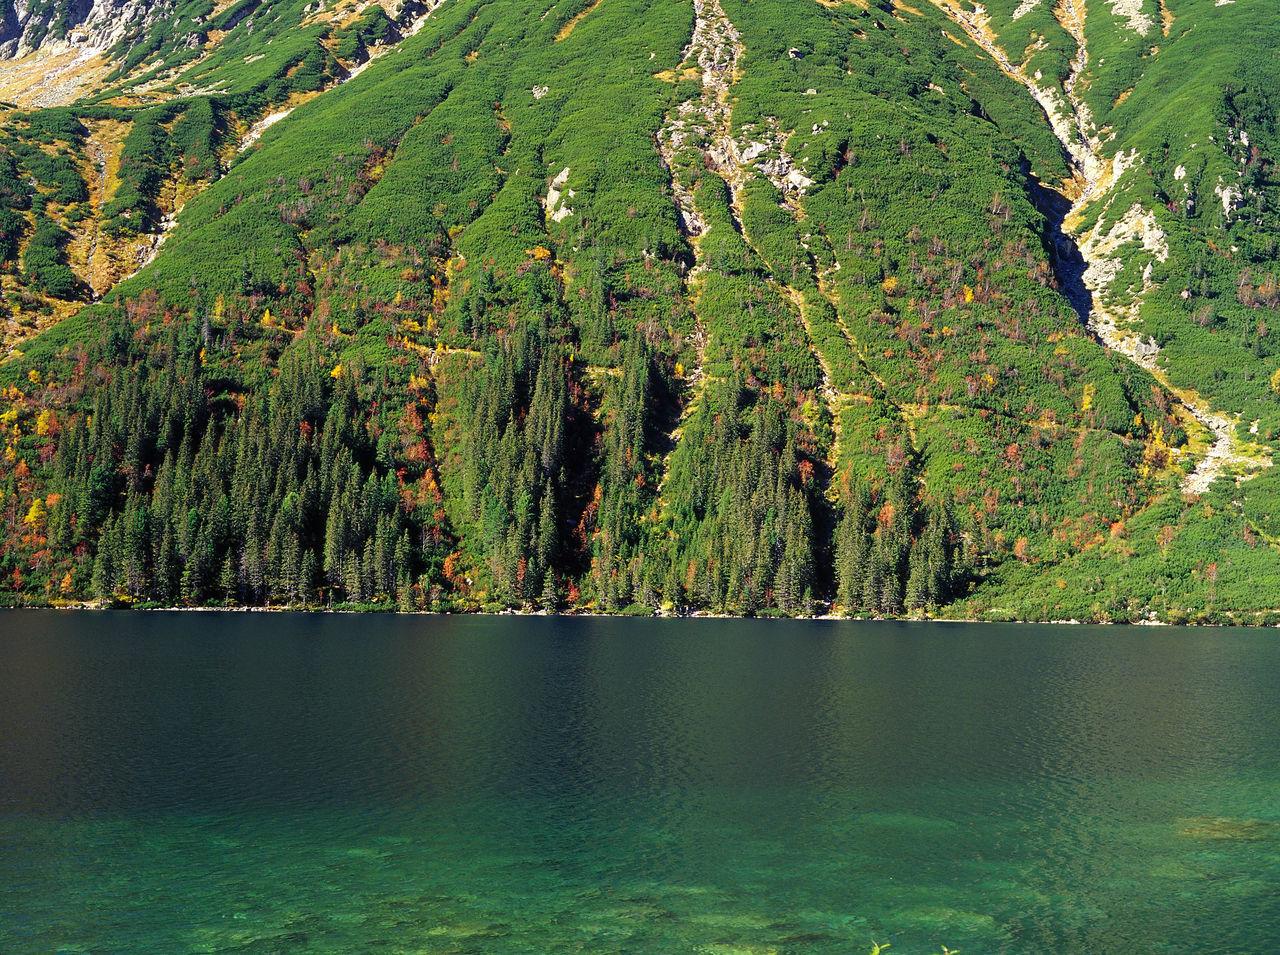 Autumn Beauty In Nature Lake Morskie Oko Morskie Oko Morskieoko Mountain Mountain Lake Mountain Landscape Mountain Range Mountains Nature Outdoors Scenics Tatry Tatrymountains